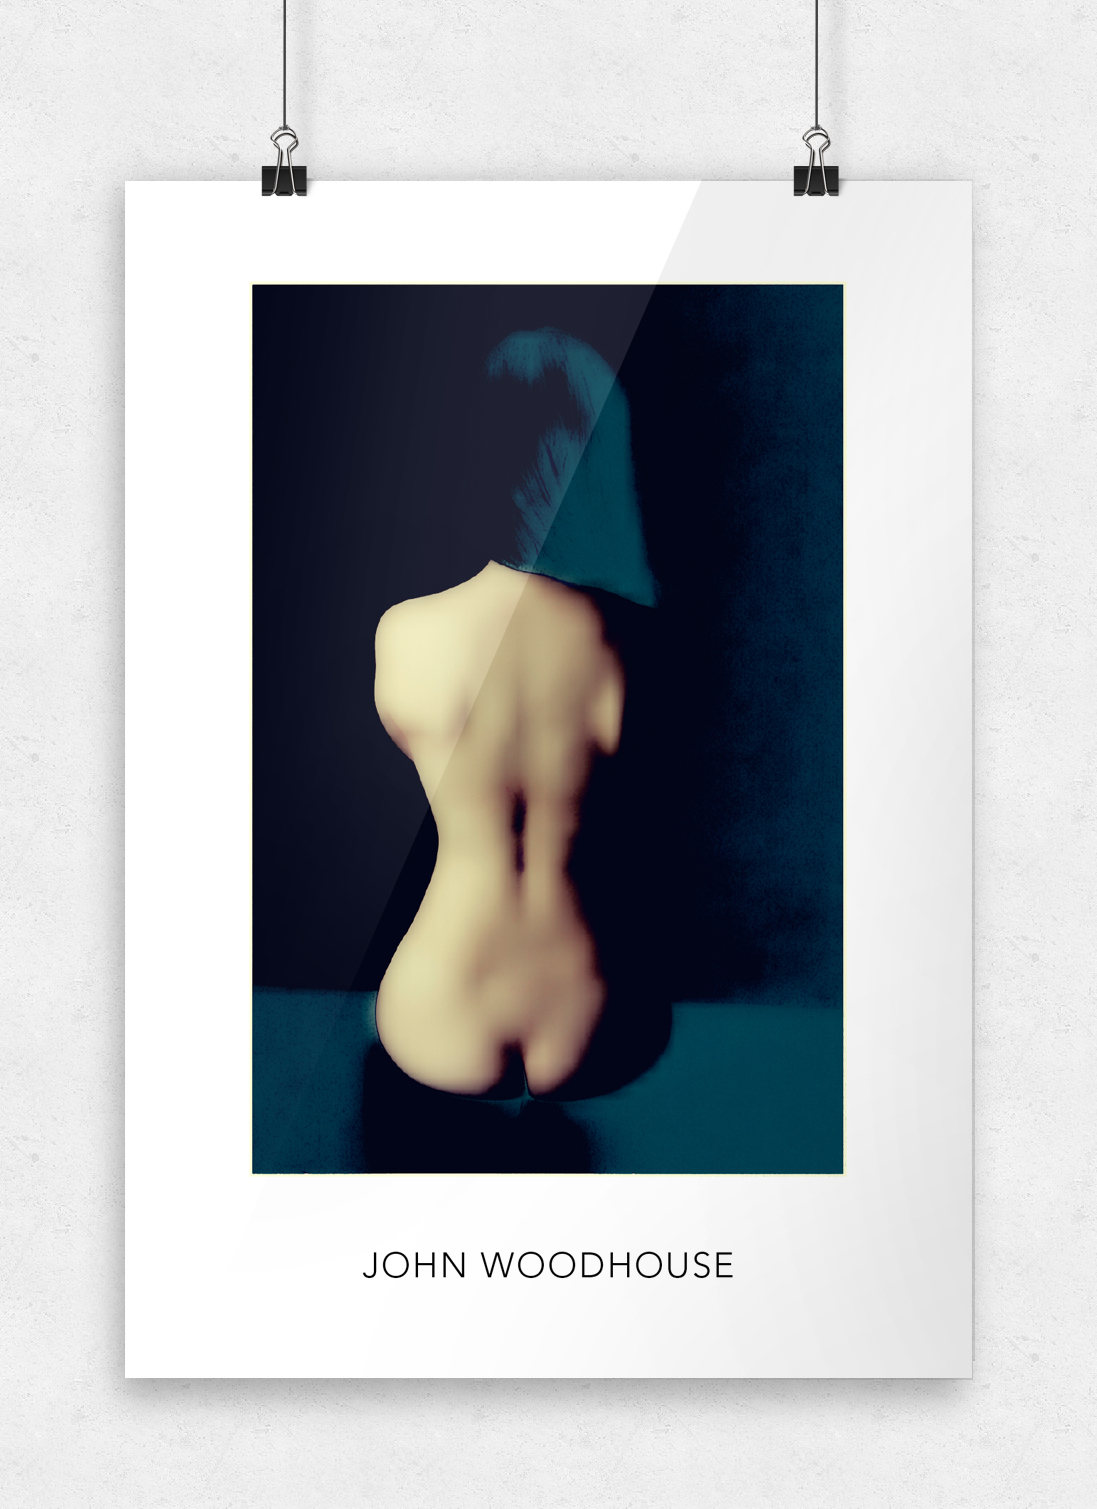 JW-Posters-Template_17.jpg